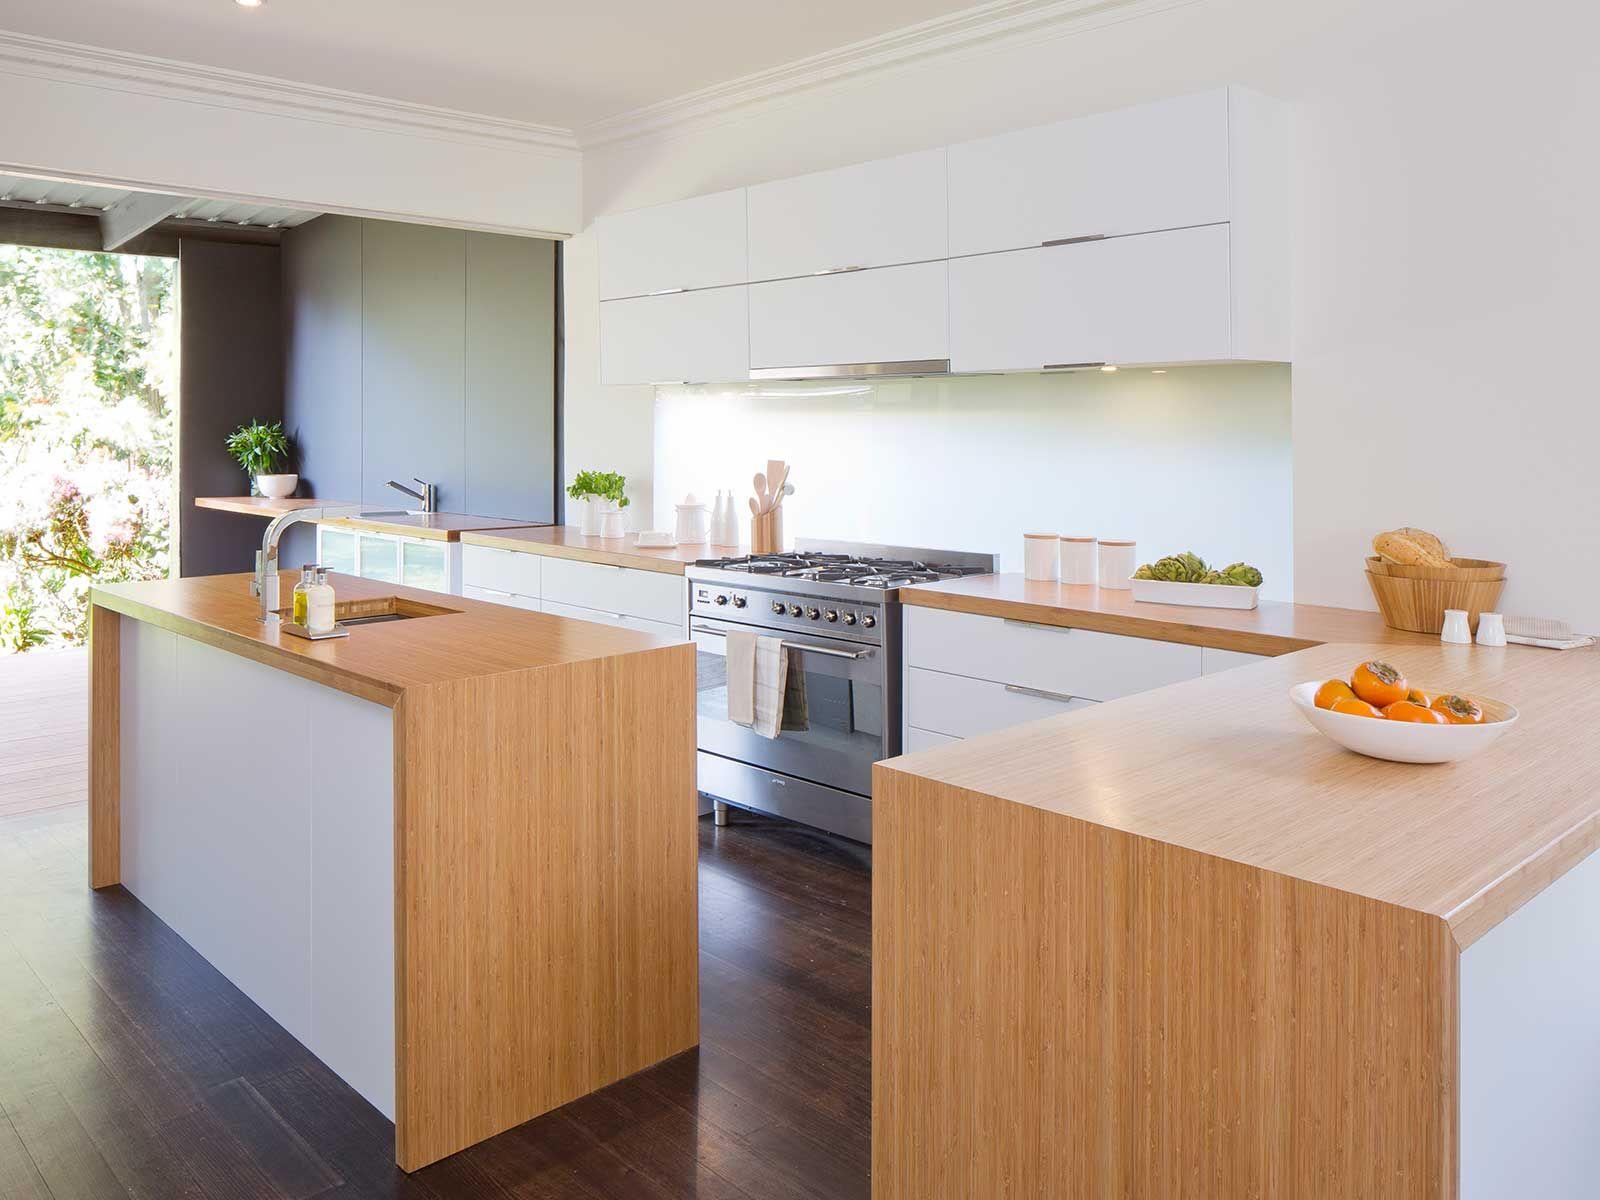 picture bunnings kaboodle bamboo kitchen google search keukens woonkamer keuken keuken on kaboodle kitchen design id=53018